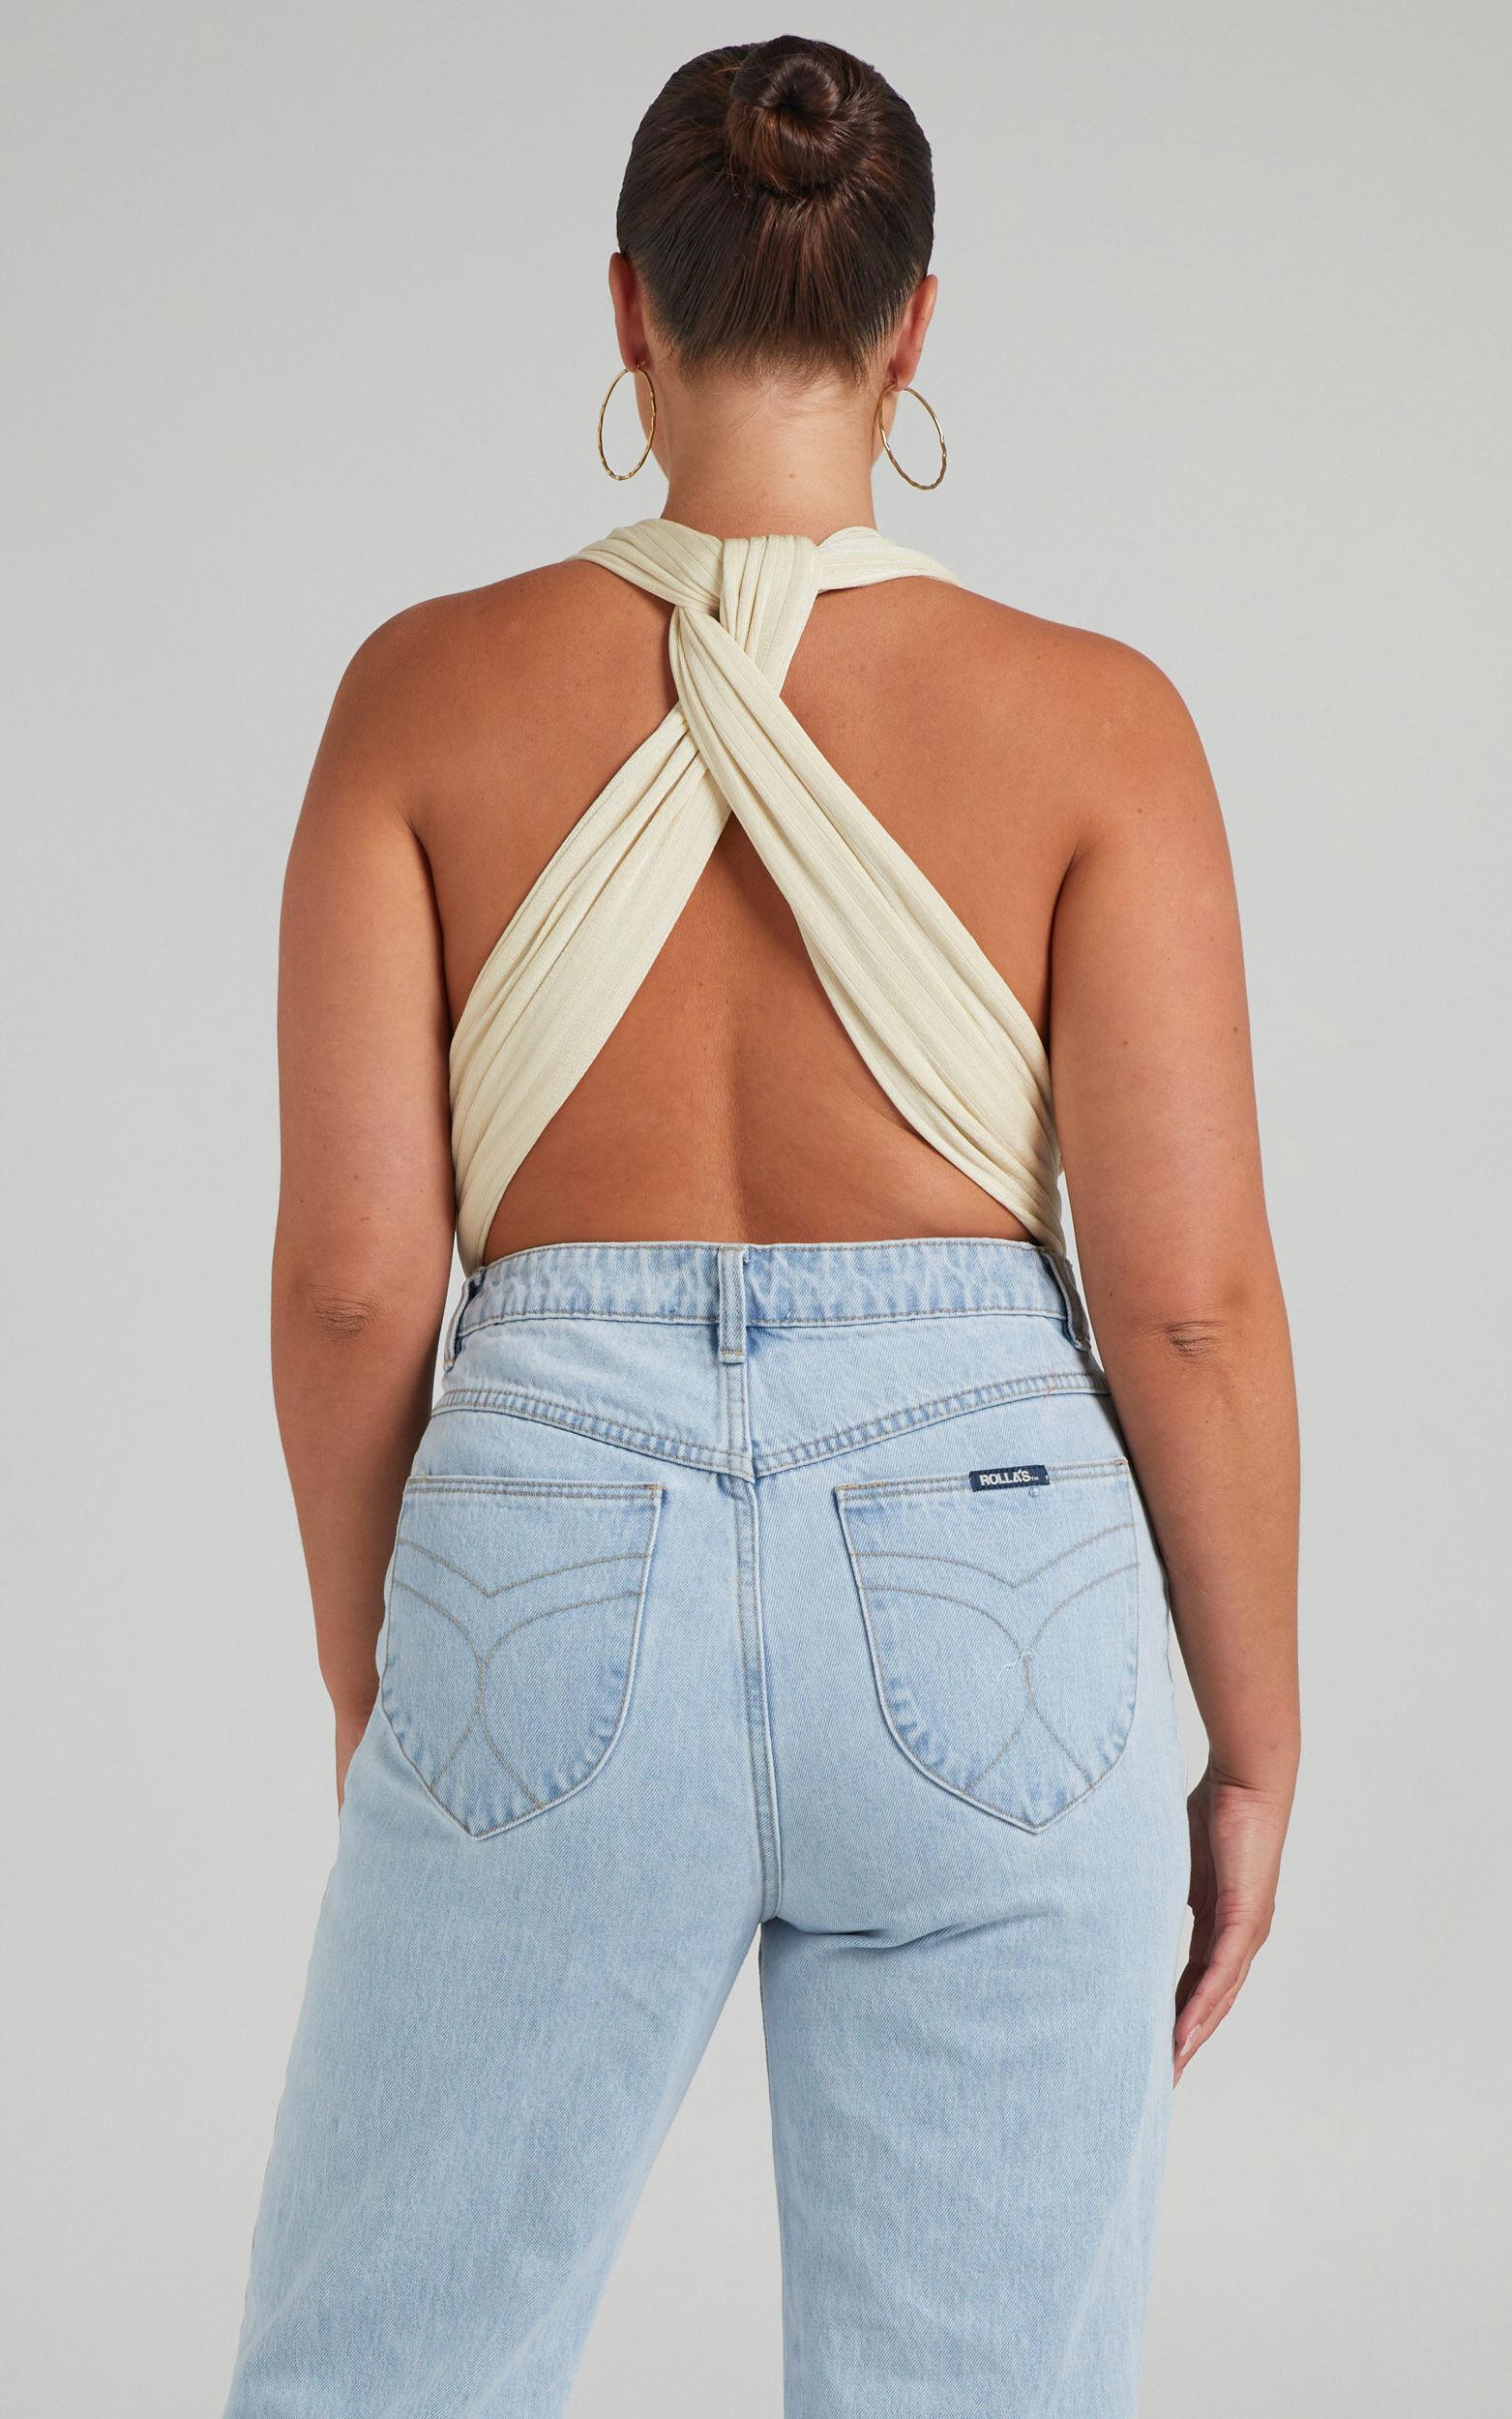 Kimbaa Slinky Multi tie bodysuit in Cream - 06, CRE4, super-hi-res image number null